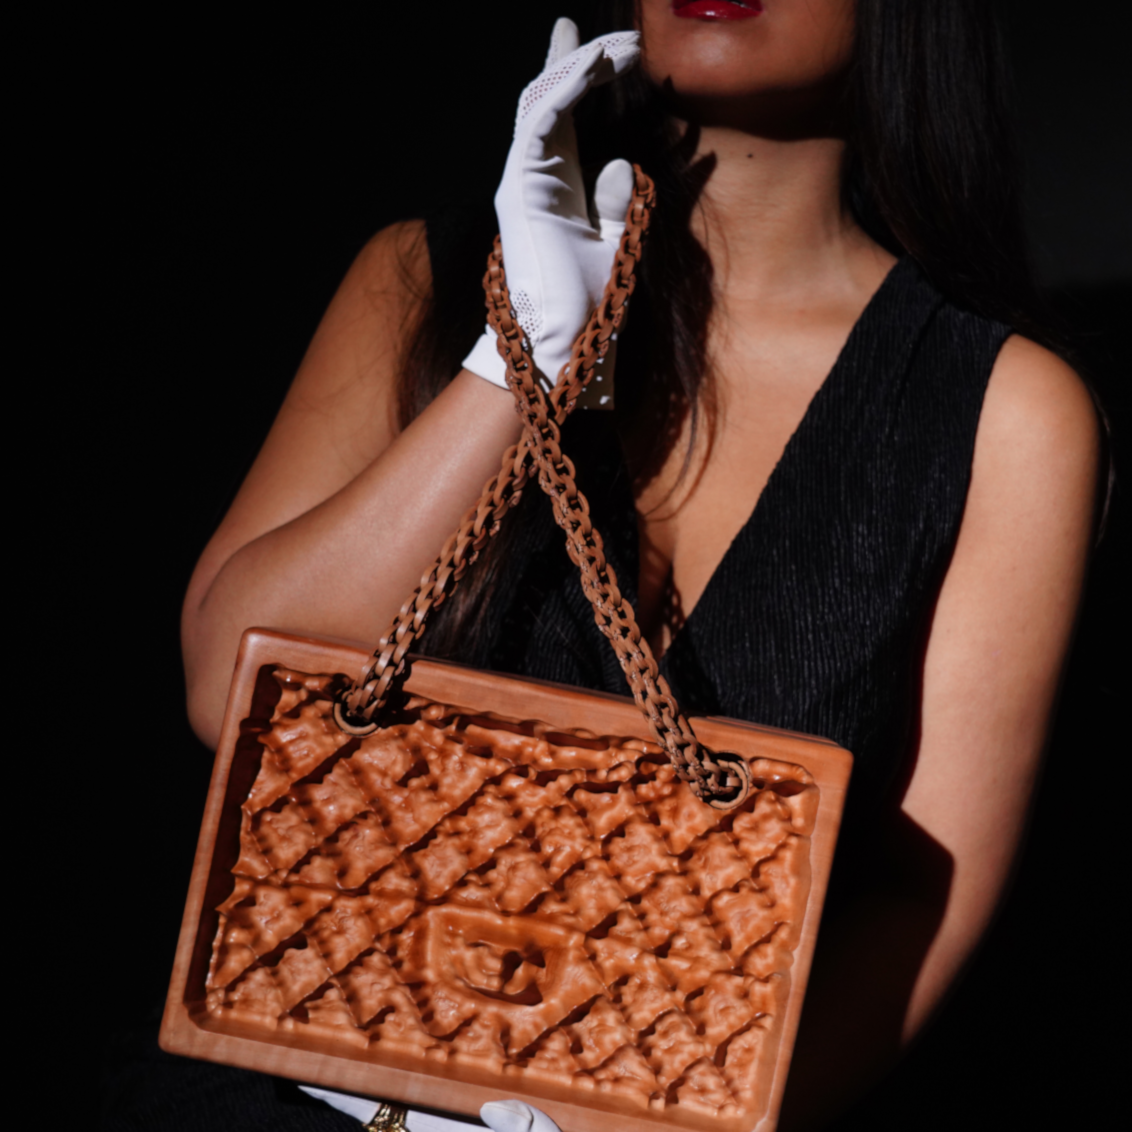 Model showcasing a Chanel handbag made from unique material